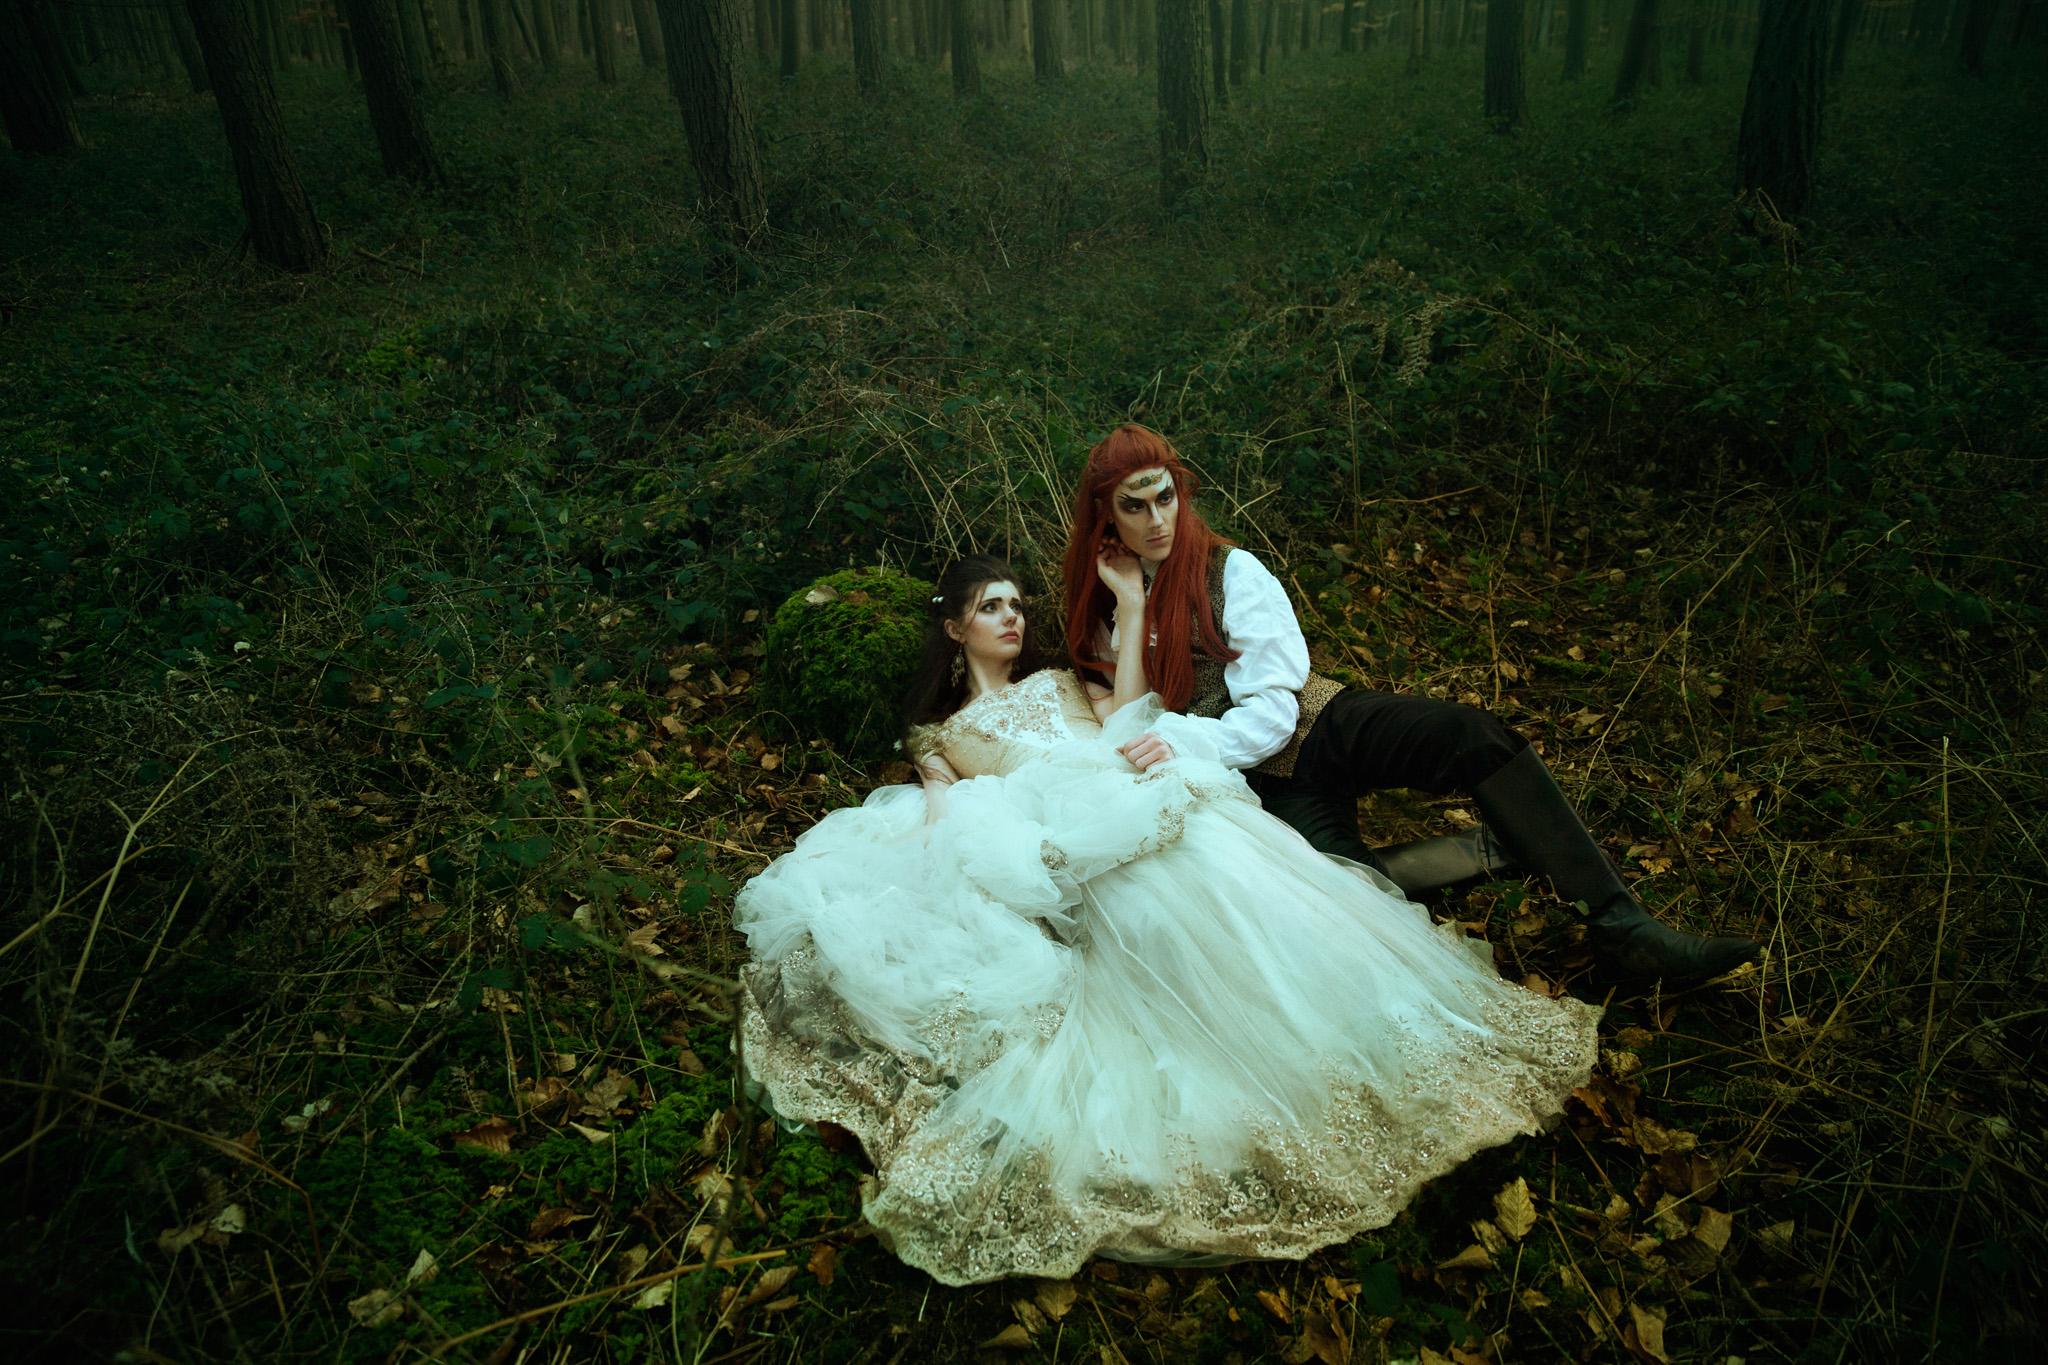 bella-kotak-fairytale-fairytales-labyrinth-david-bowie-sarah-beauty-beast-magic-magical-faerie-magazine-editorial-firefly-path-twilight-woods-lantern-ethereal-fairy-disney-ian-hencher-9s.jpg